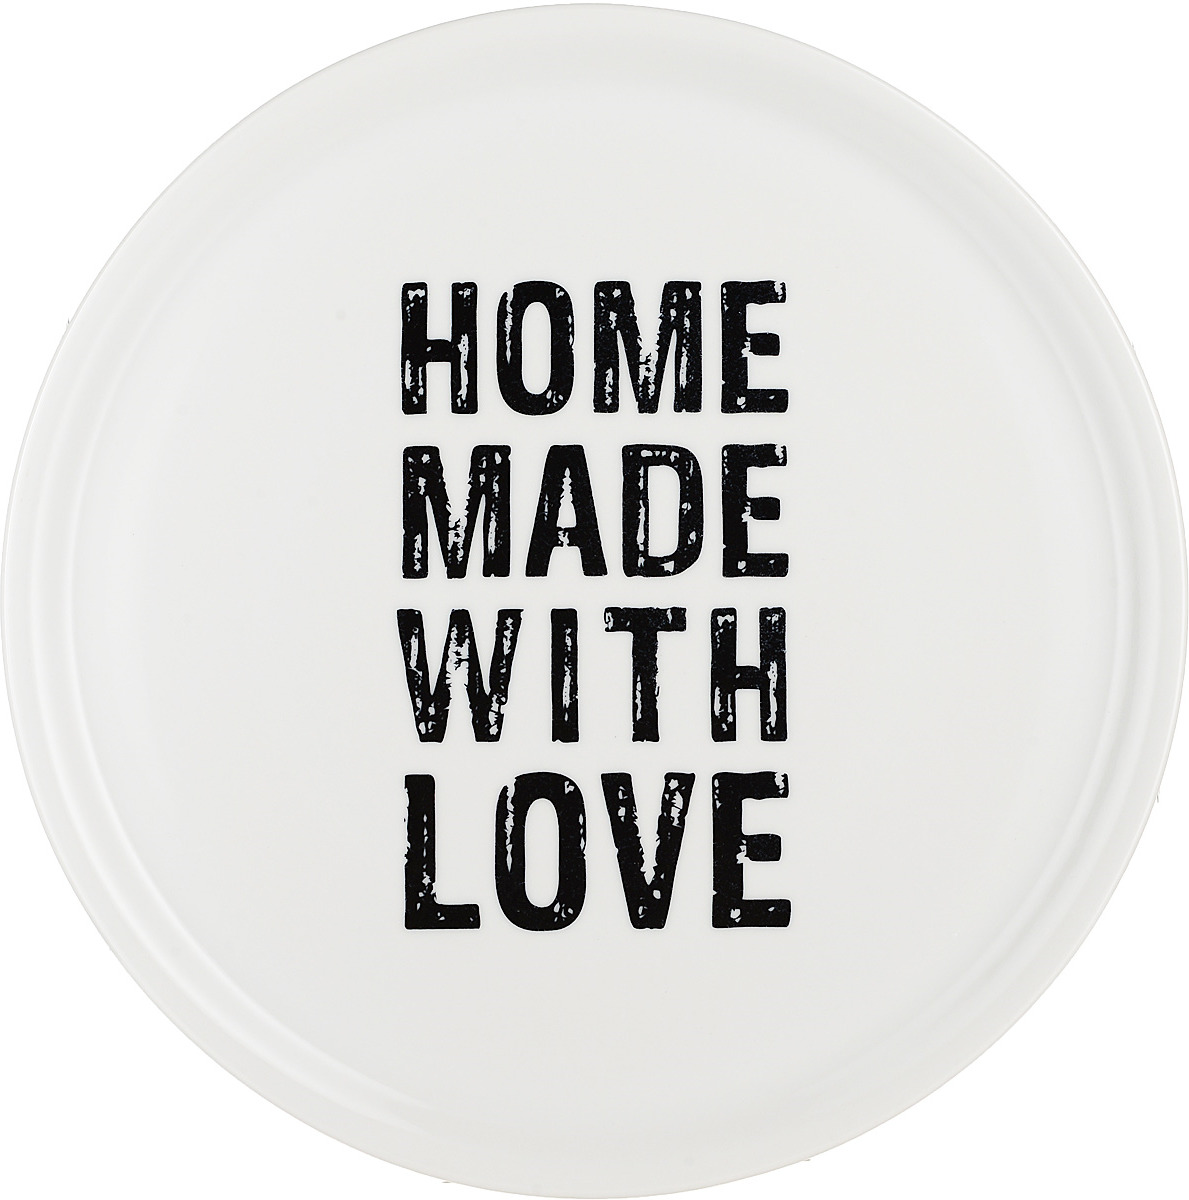 Тарелка для пиццы Tescoma Home Made With Love, цвет: белый, черный, 33 см тарелка tescoma legend 385324